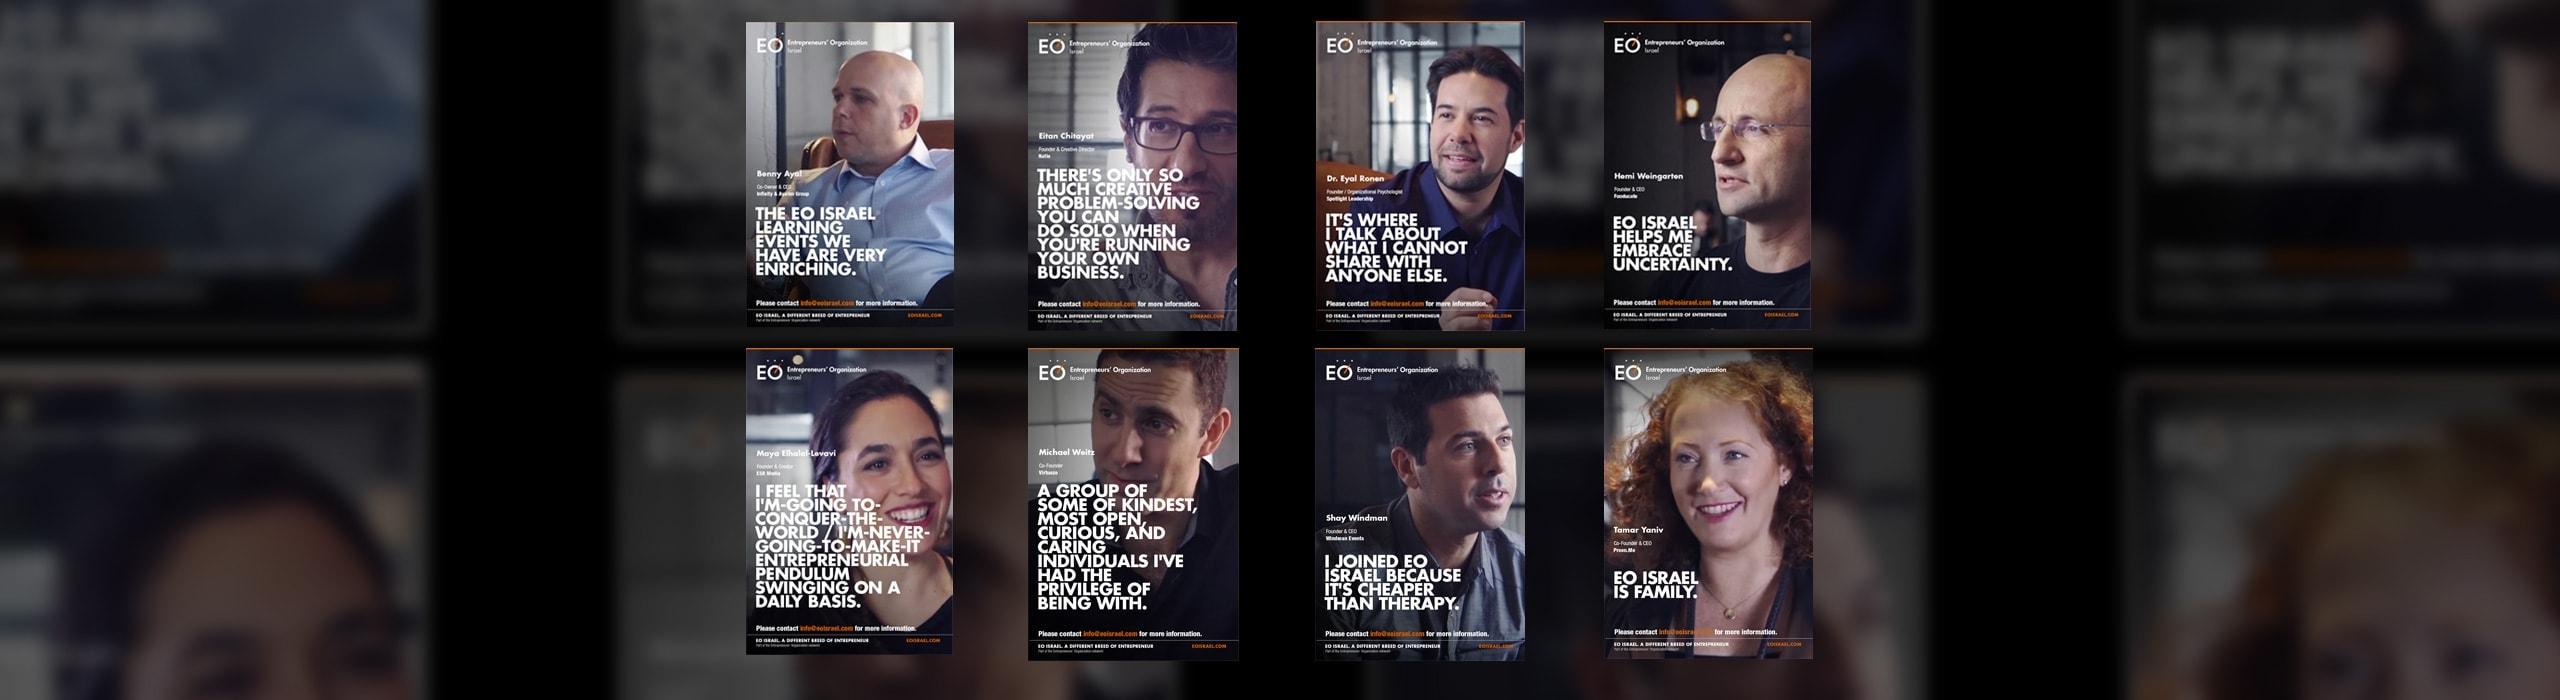 EO Israel - natie-eo-israel-posters - Natie Branding Agency